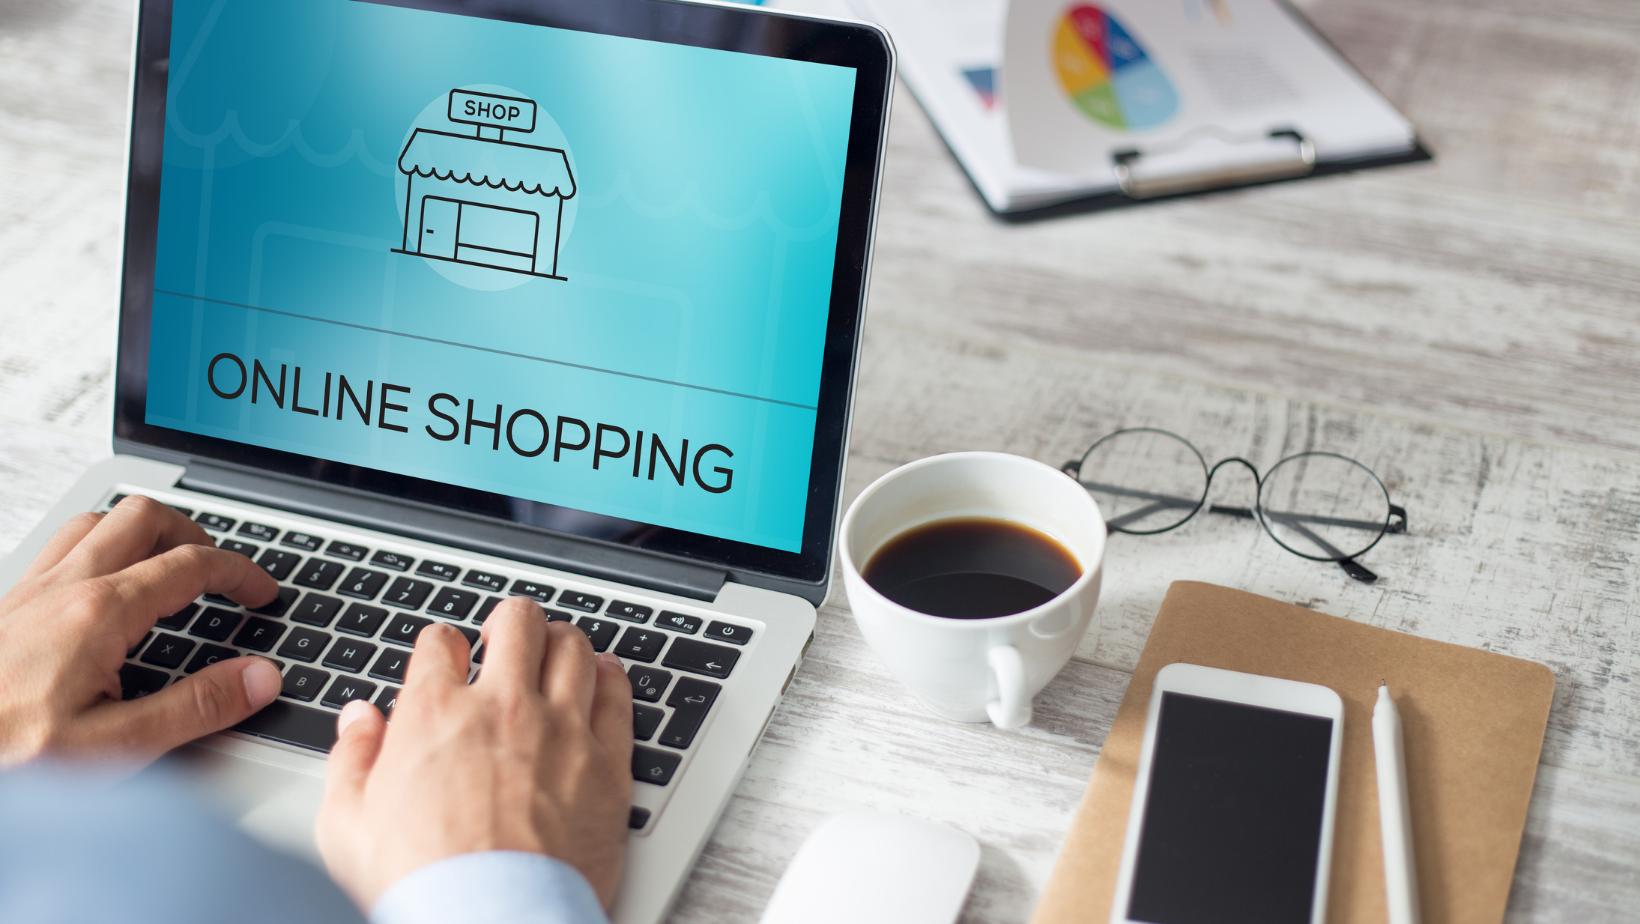 regulamin sklepu niezgodny z prawem, regulamin sklepu internetowego zgodny z rodo